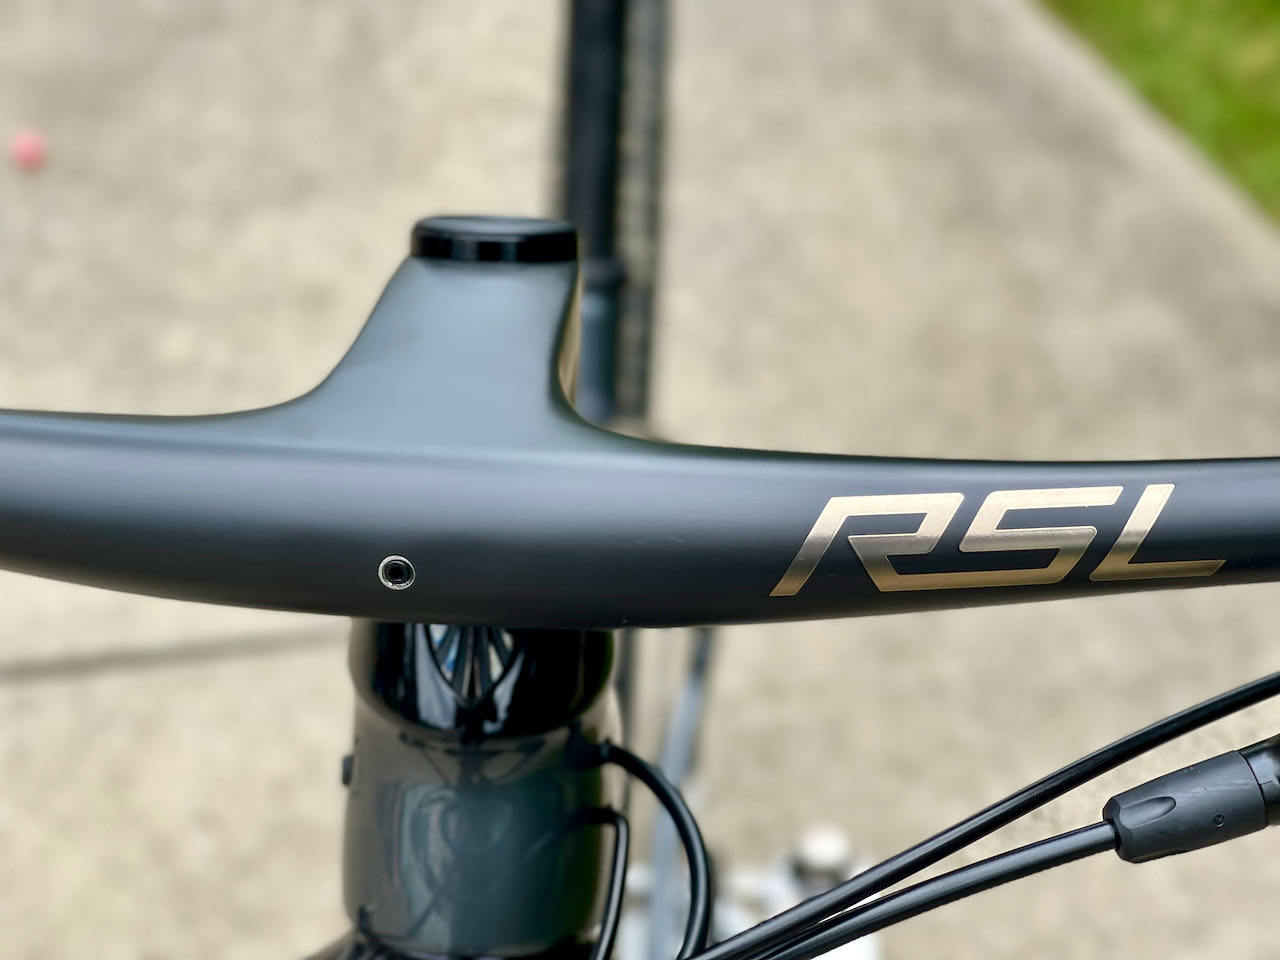 Bontrager RSL MTB Bars installed on bike accessory mont